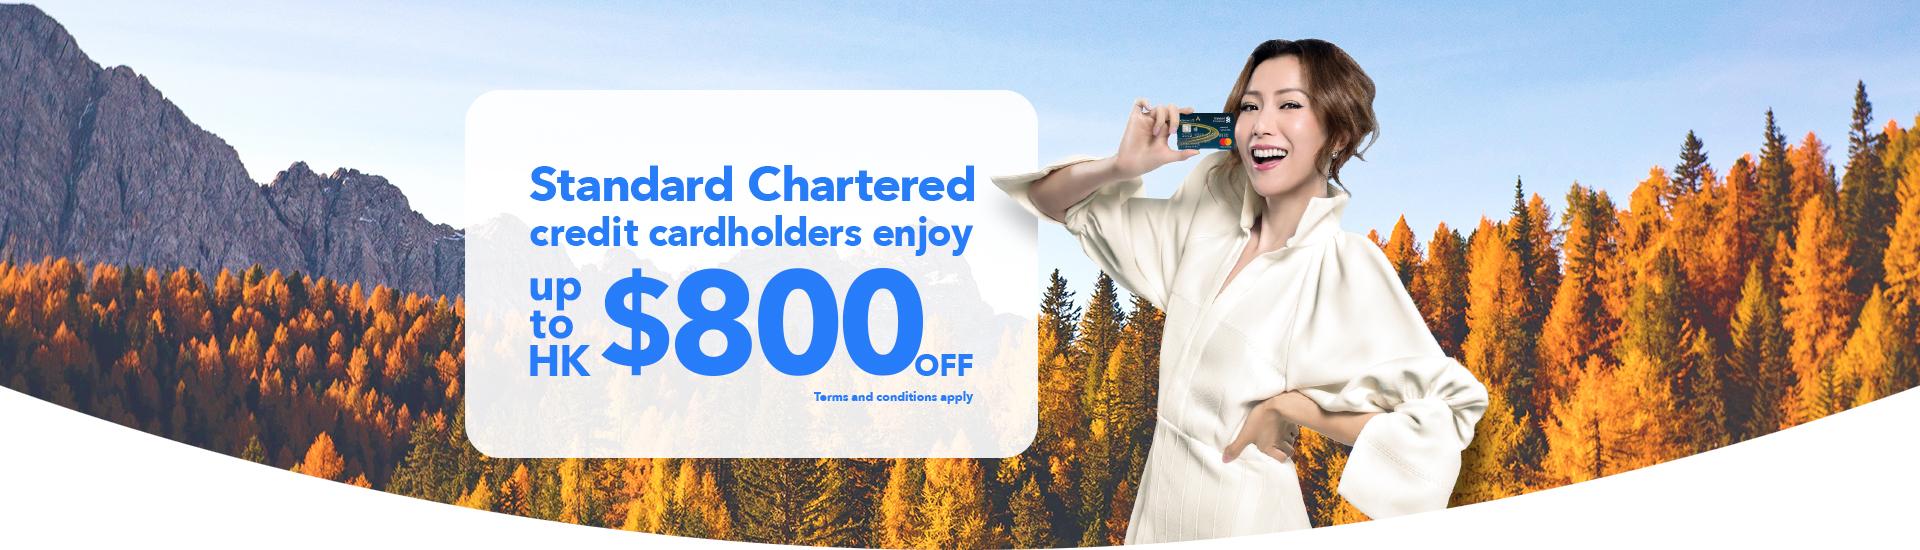 Trip.com Hong Kong Standard Chartered Bank promo code